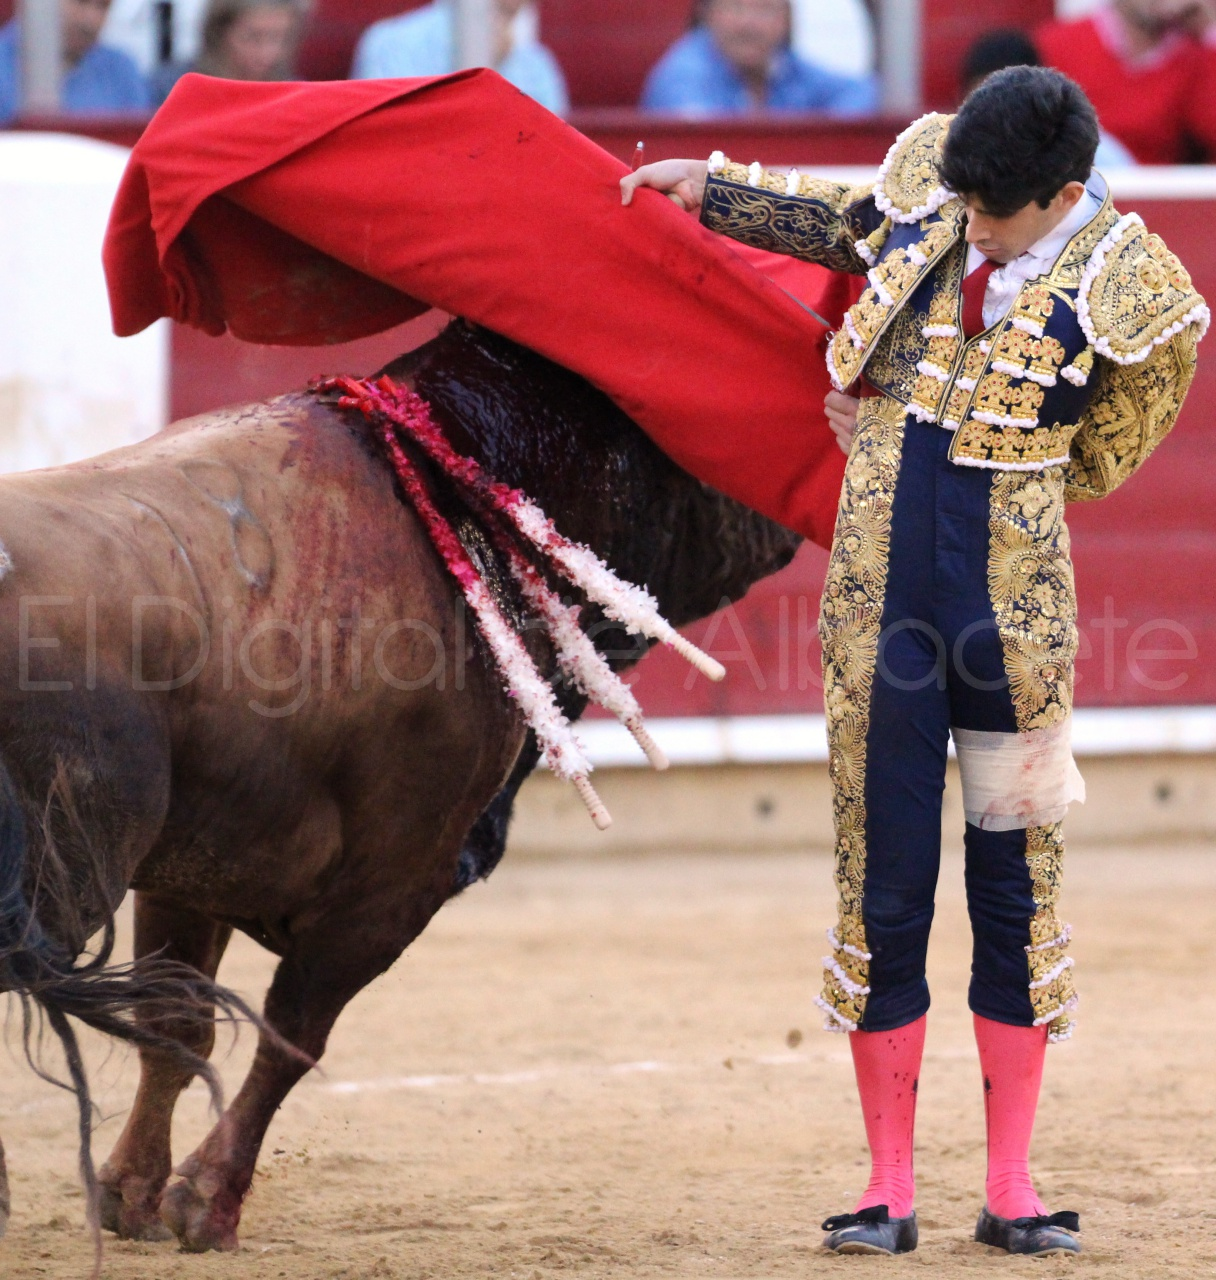 El Juli Lopez Simon y Garrido Feria Albacete 2015 toros  120